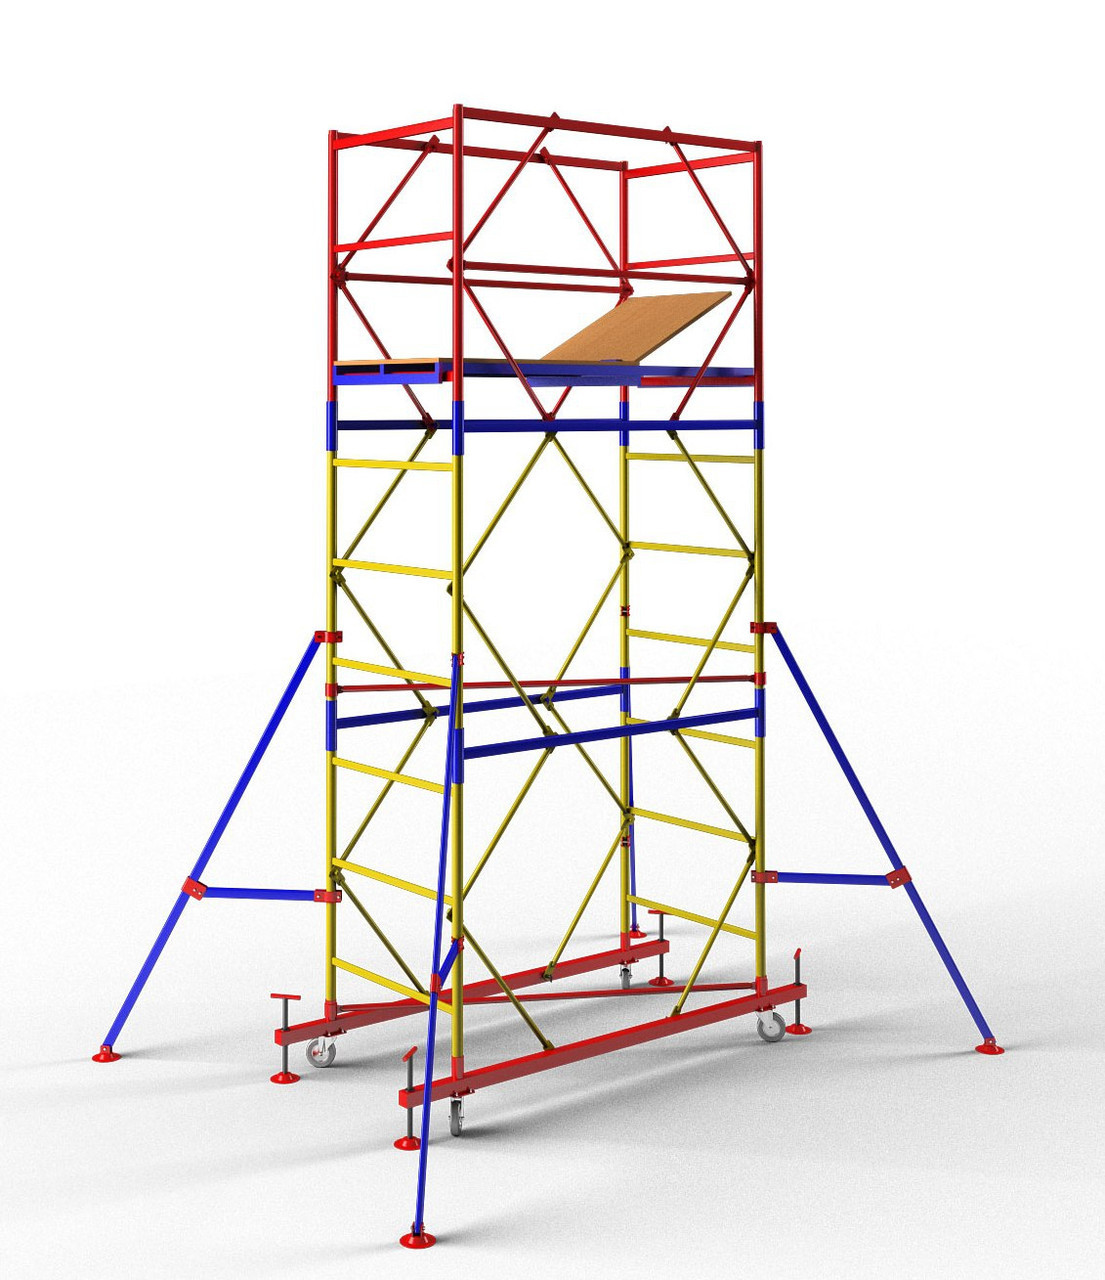 Вышка-тура мобильная облегченная 1,2 х 2,0 м (7+1) Раб.высота 11 м